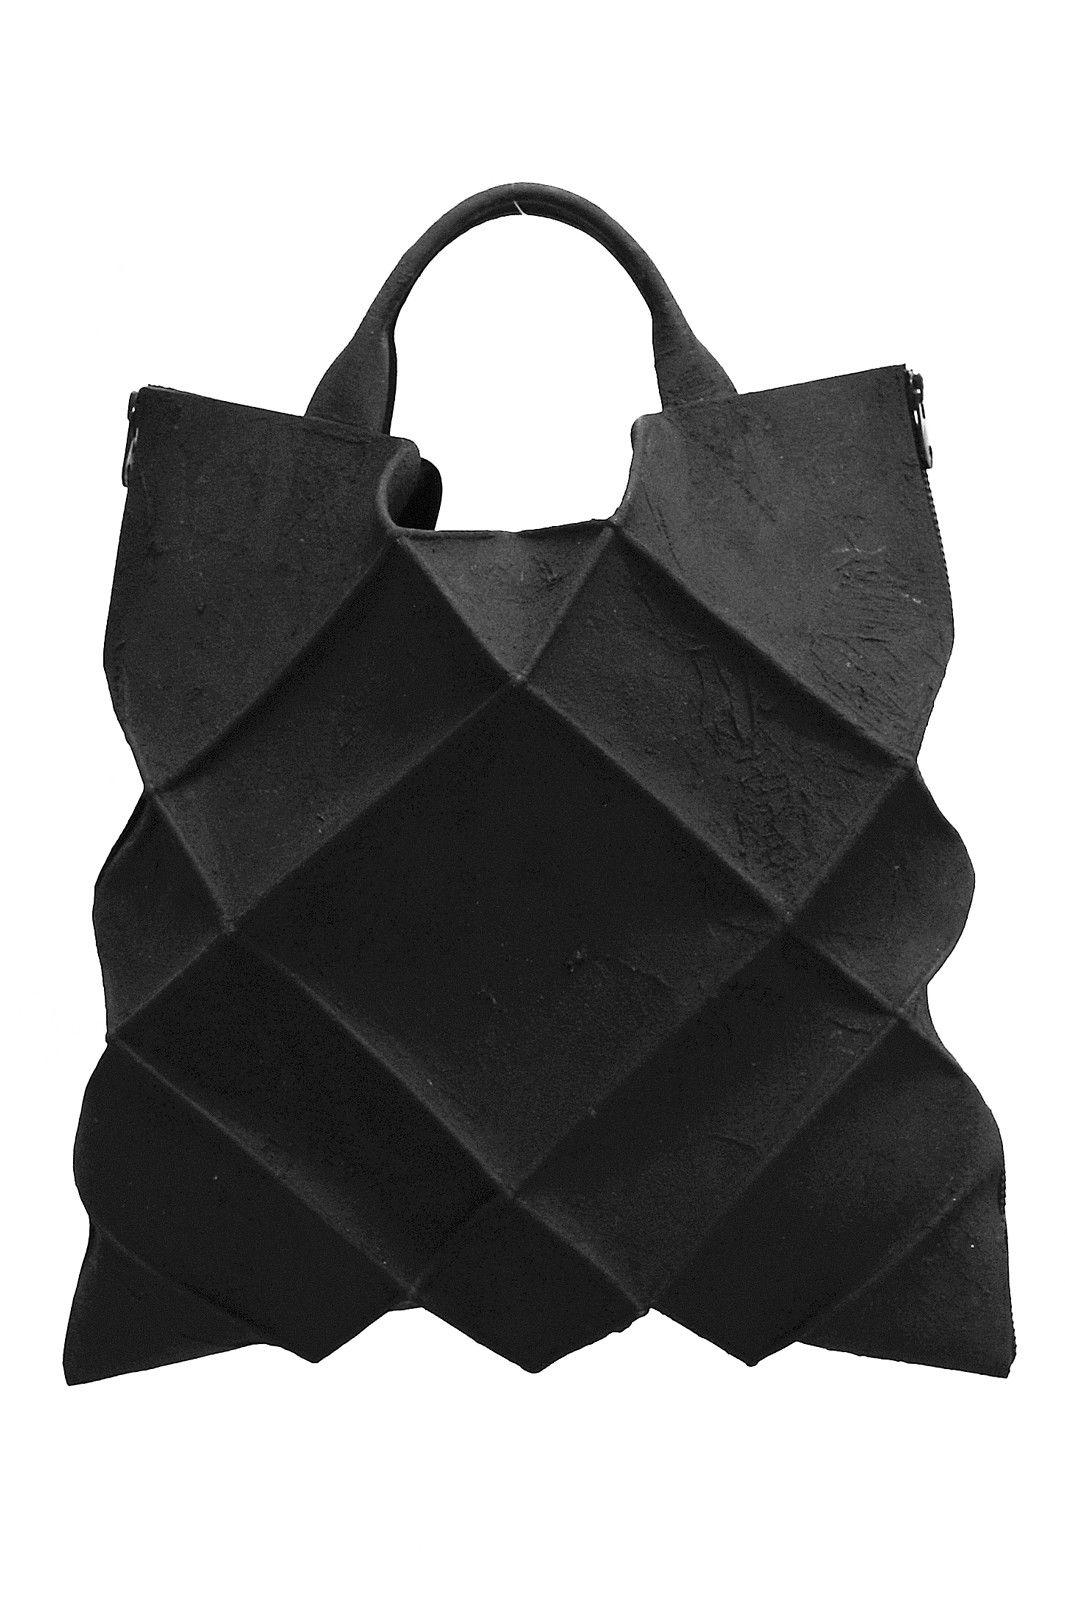 Kagari Yusuke Black Leather Putty Geometric Tote Bag Unconventional